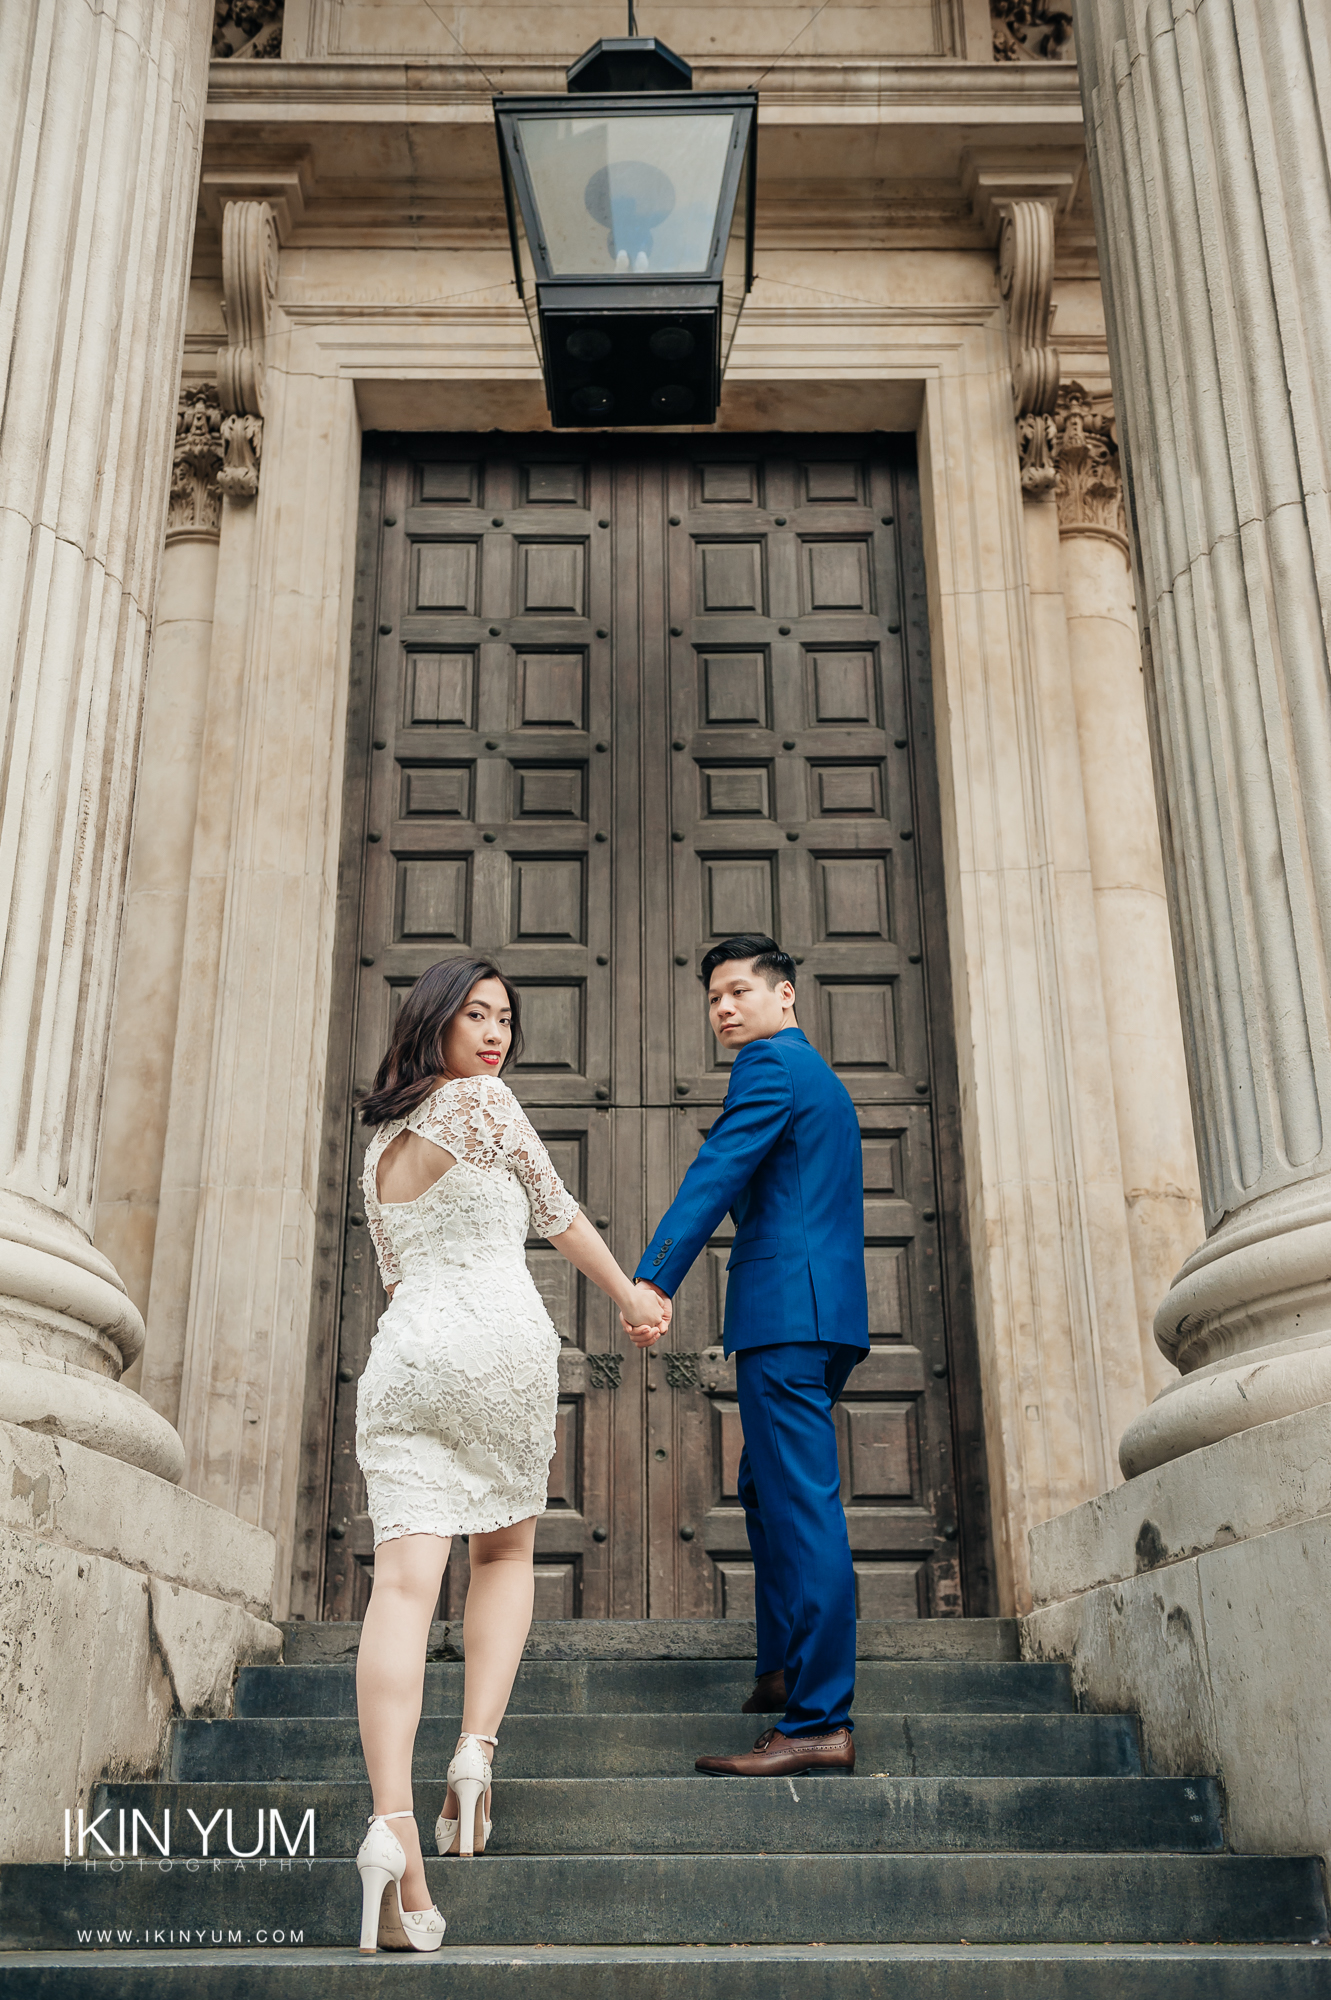 Natalie & Duncan Wedding Day - Ikin Yum Photography-114.jpg